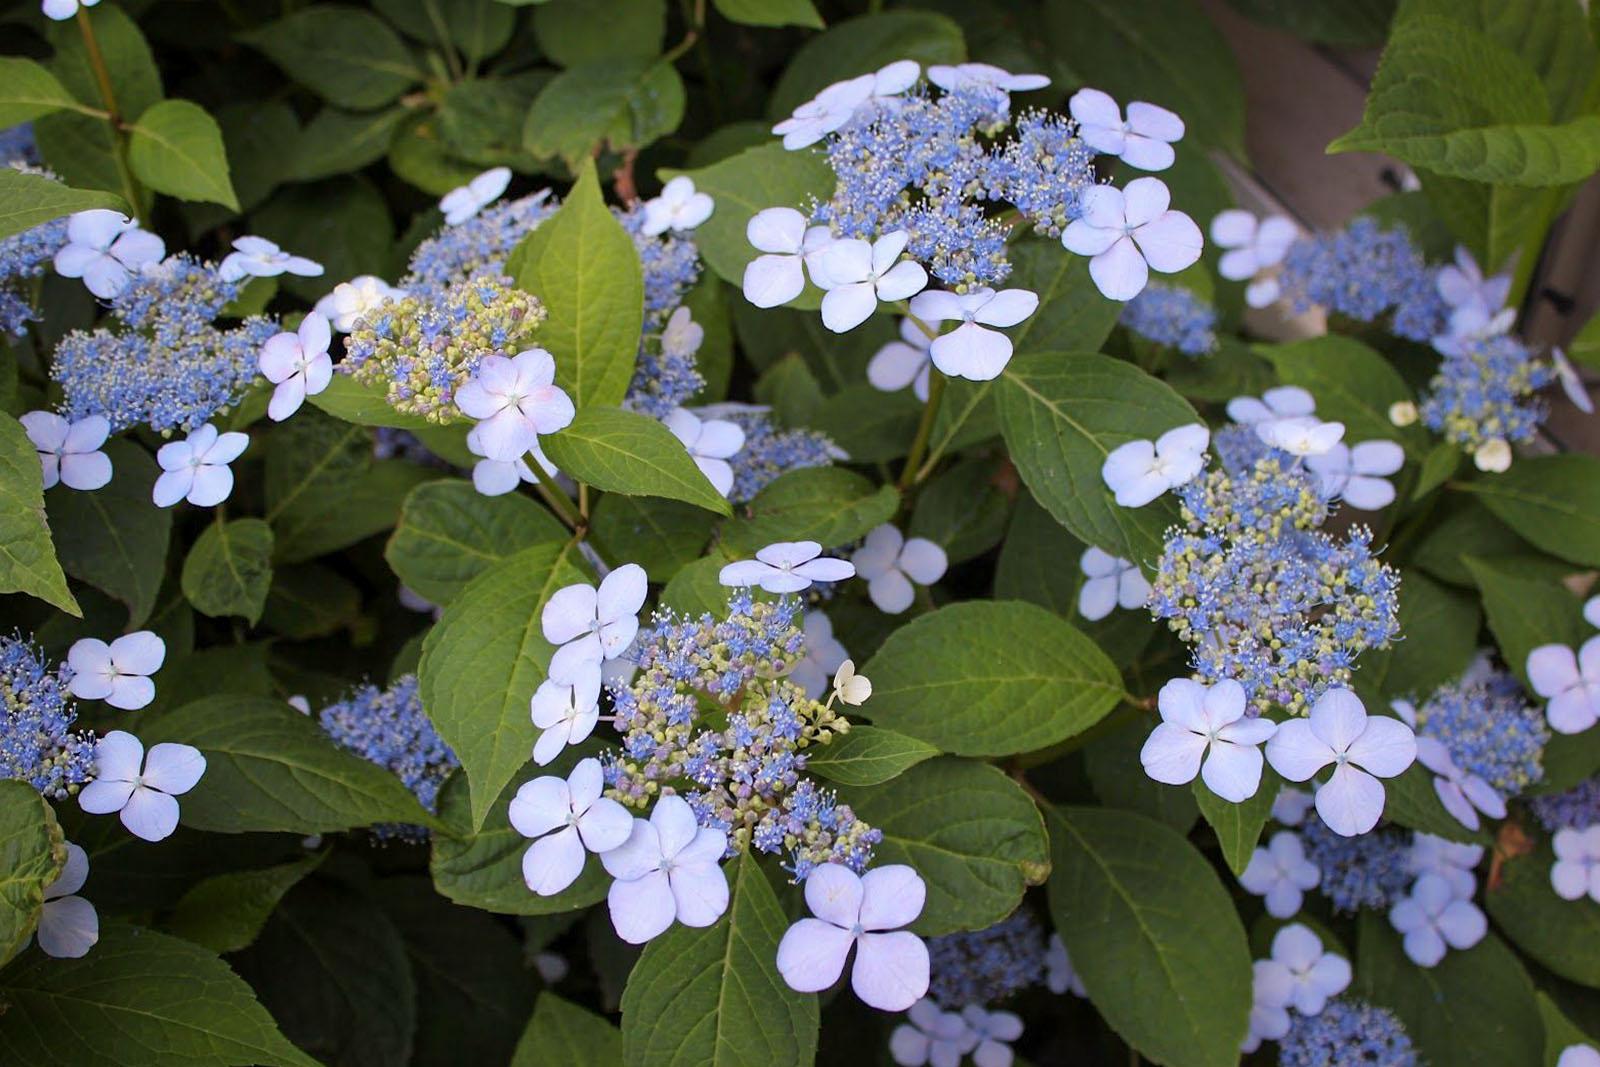 Hortenzija hydrangea serrata